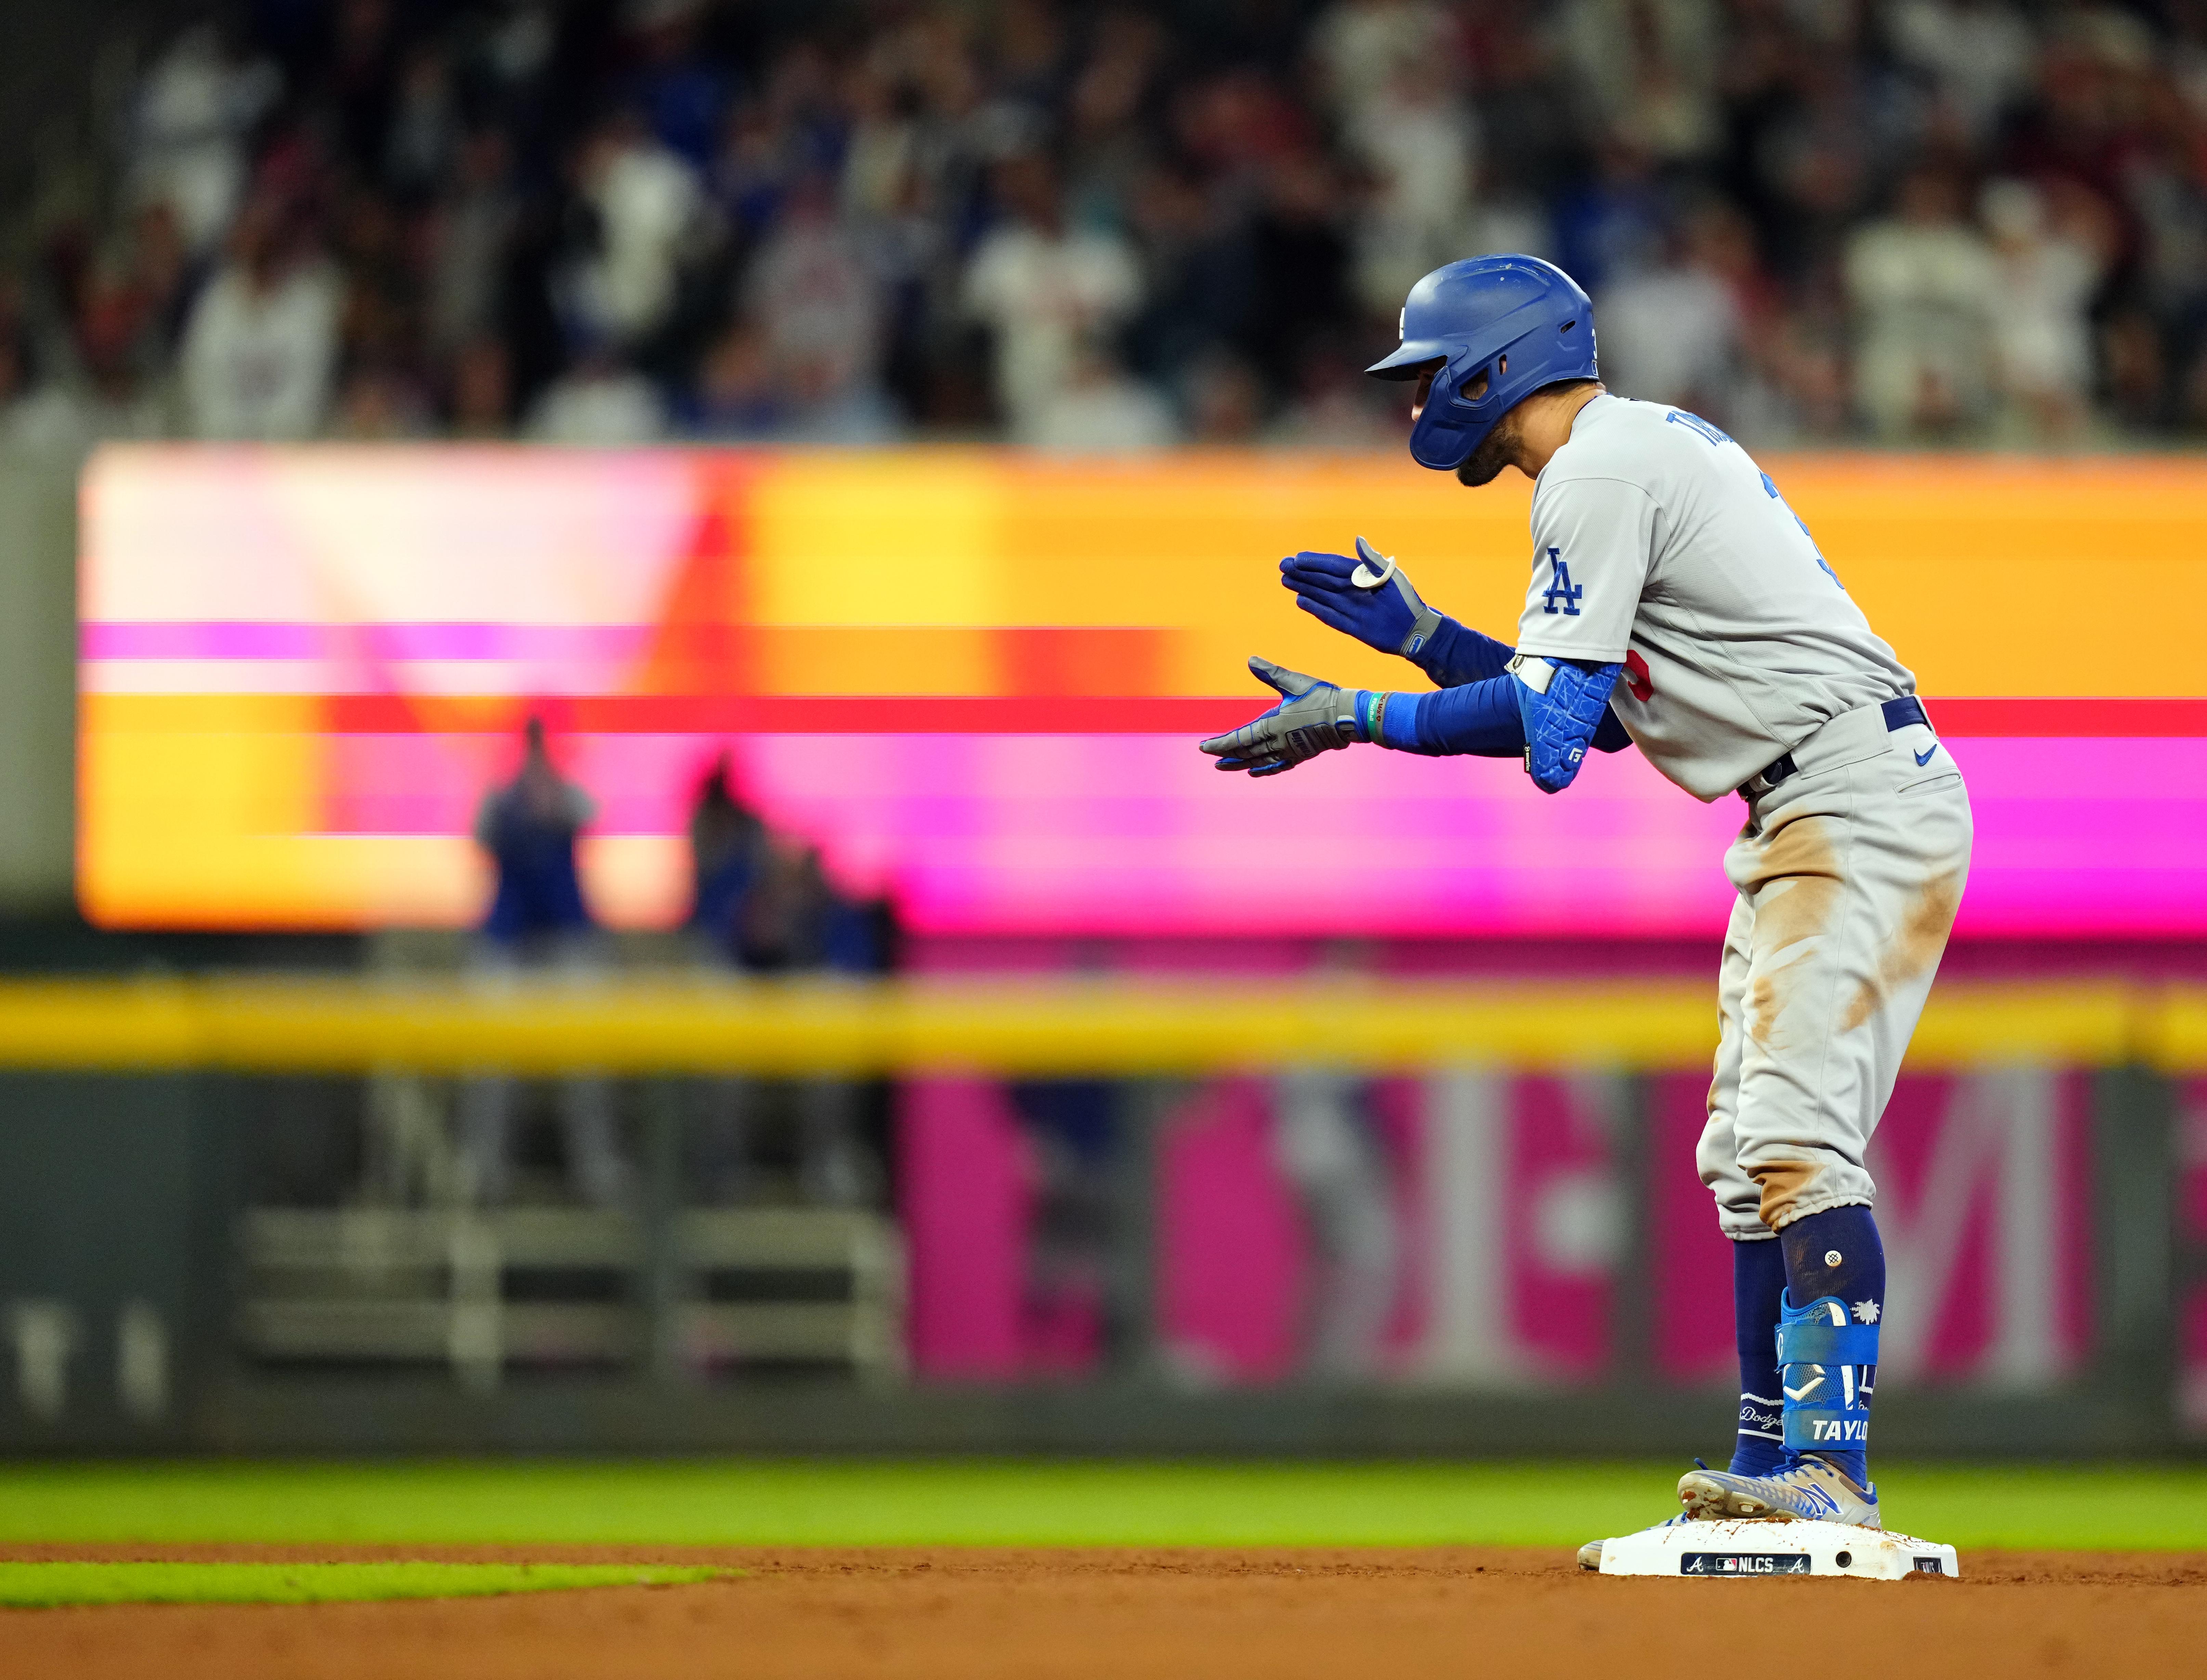 National League Championship Series Game 2: Los Angeles Dodgers v. Atlanta Braves